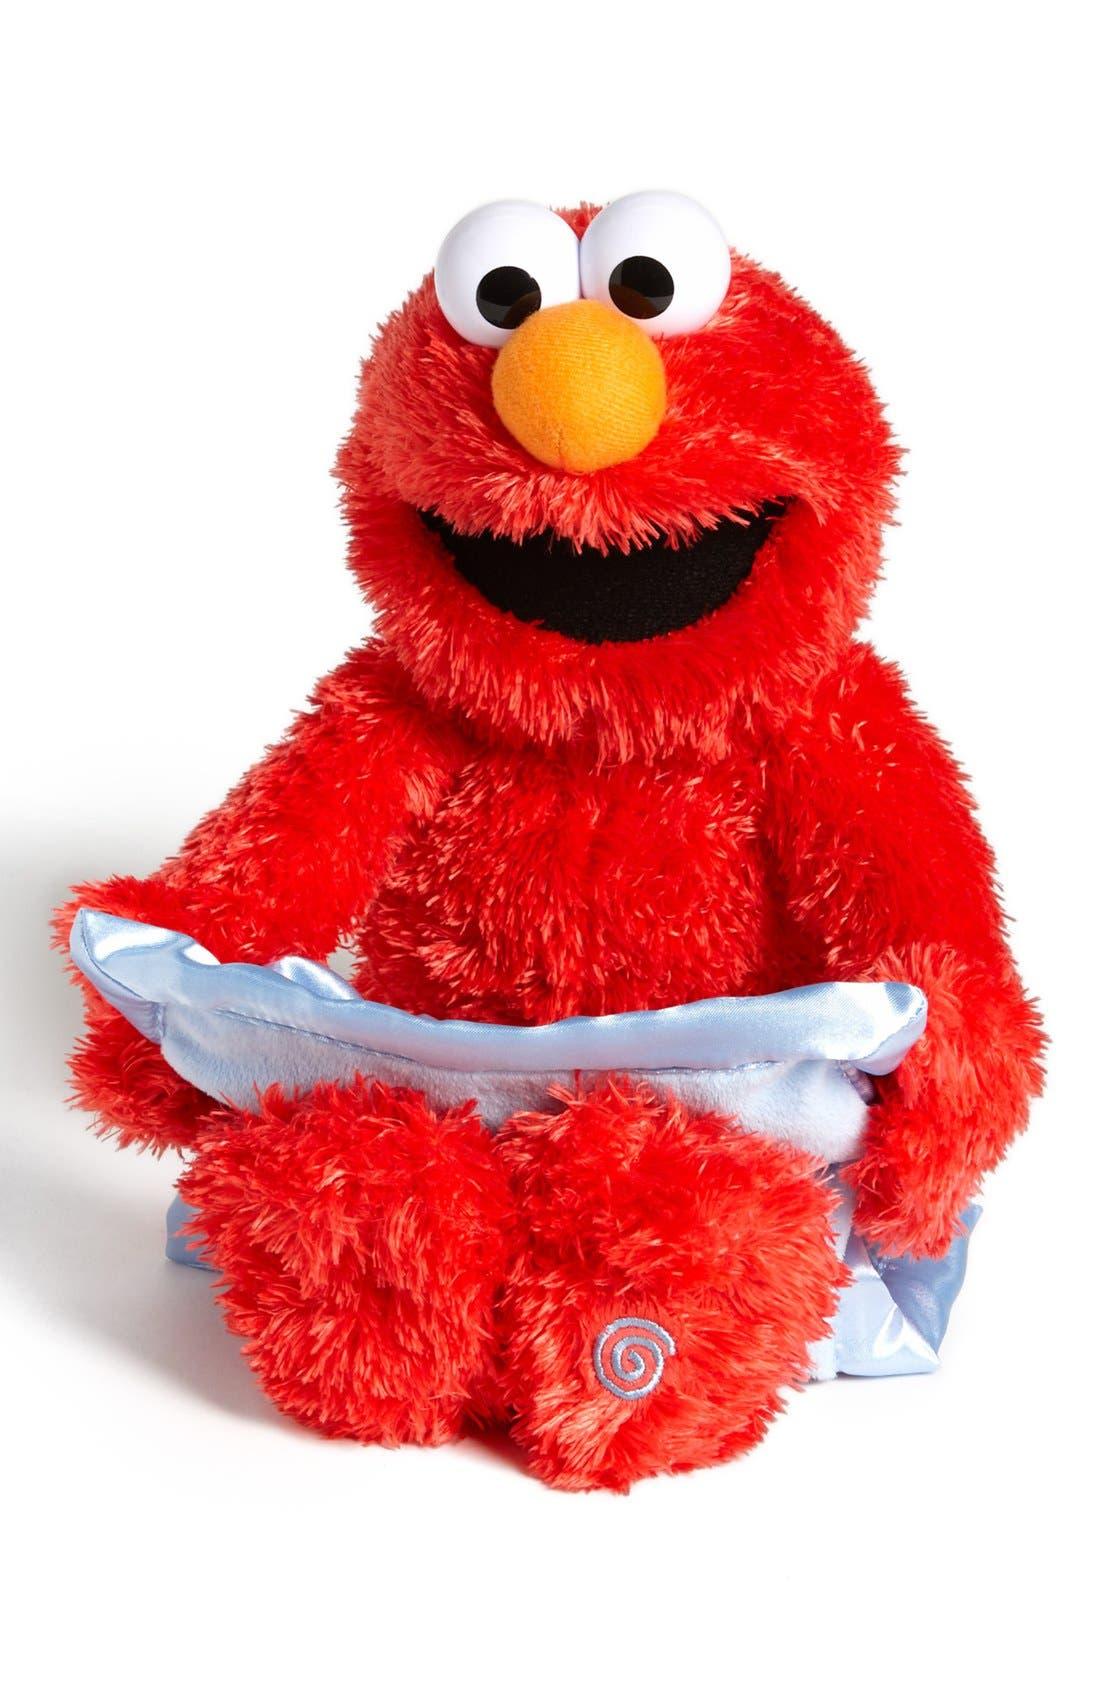 'Sesame Street<sup>®</sup> Peek-A-Boo Elmo<sup>™</sup>' Talking Plush Toy, Main, color, 600